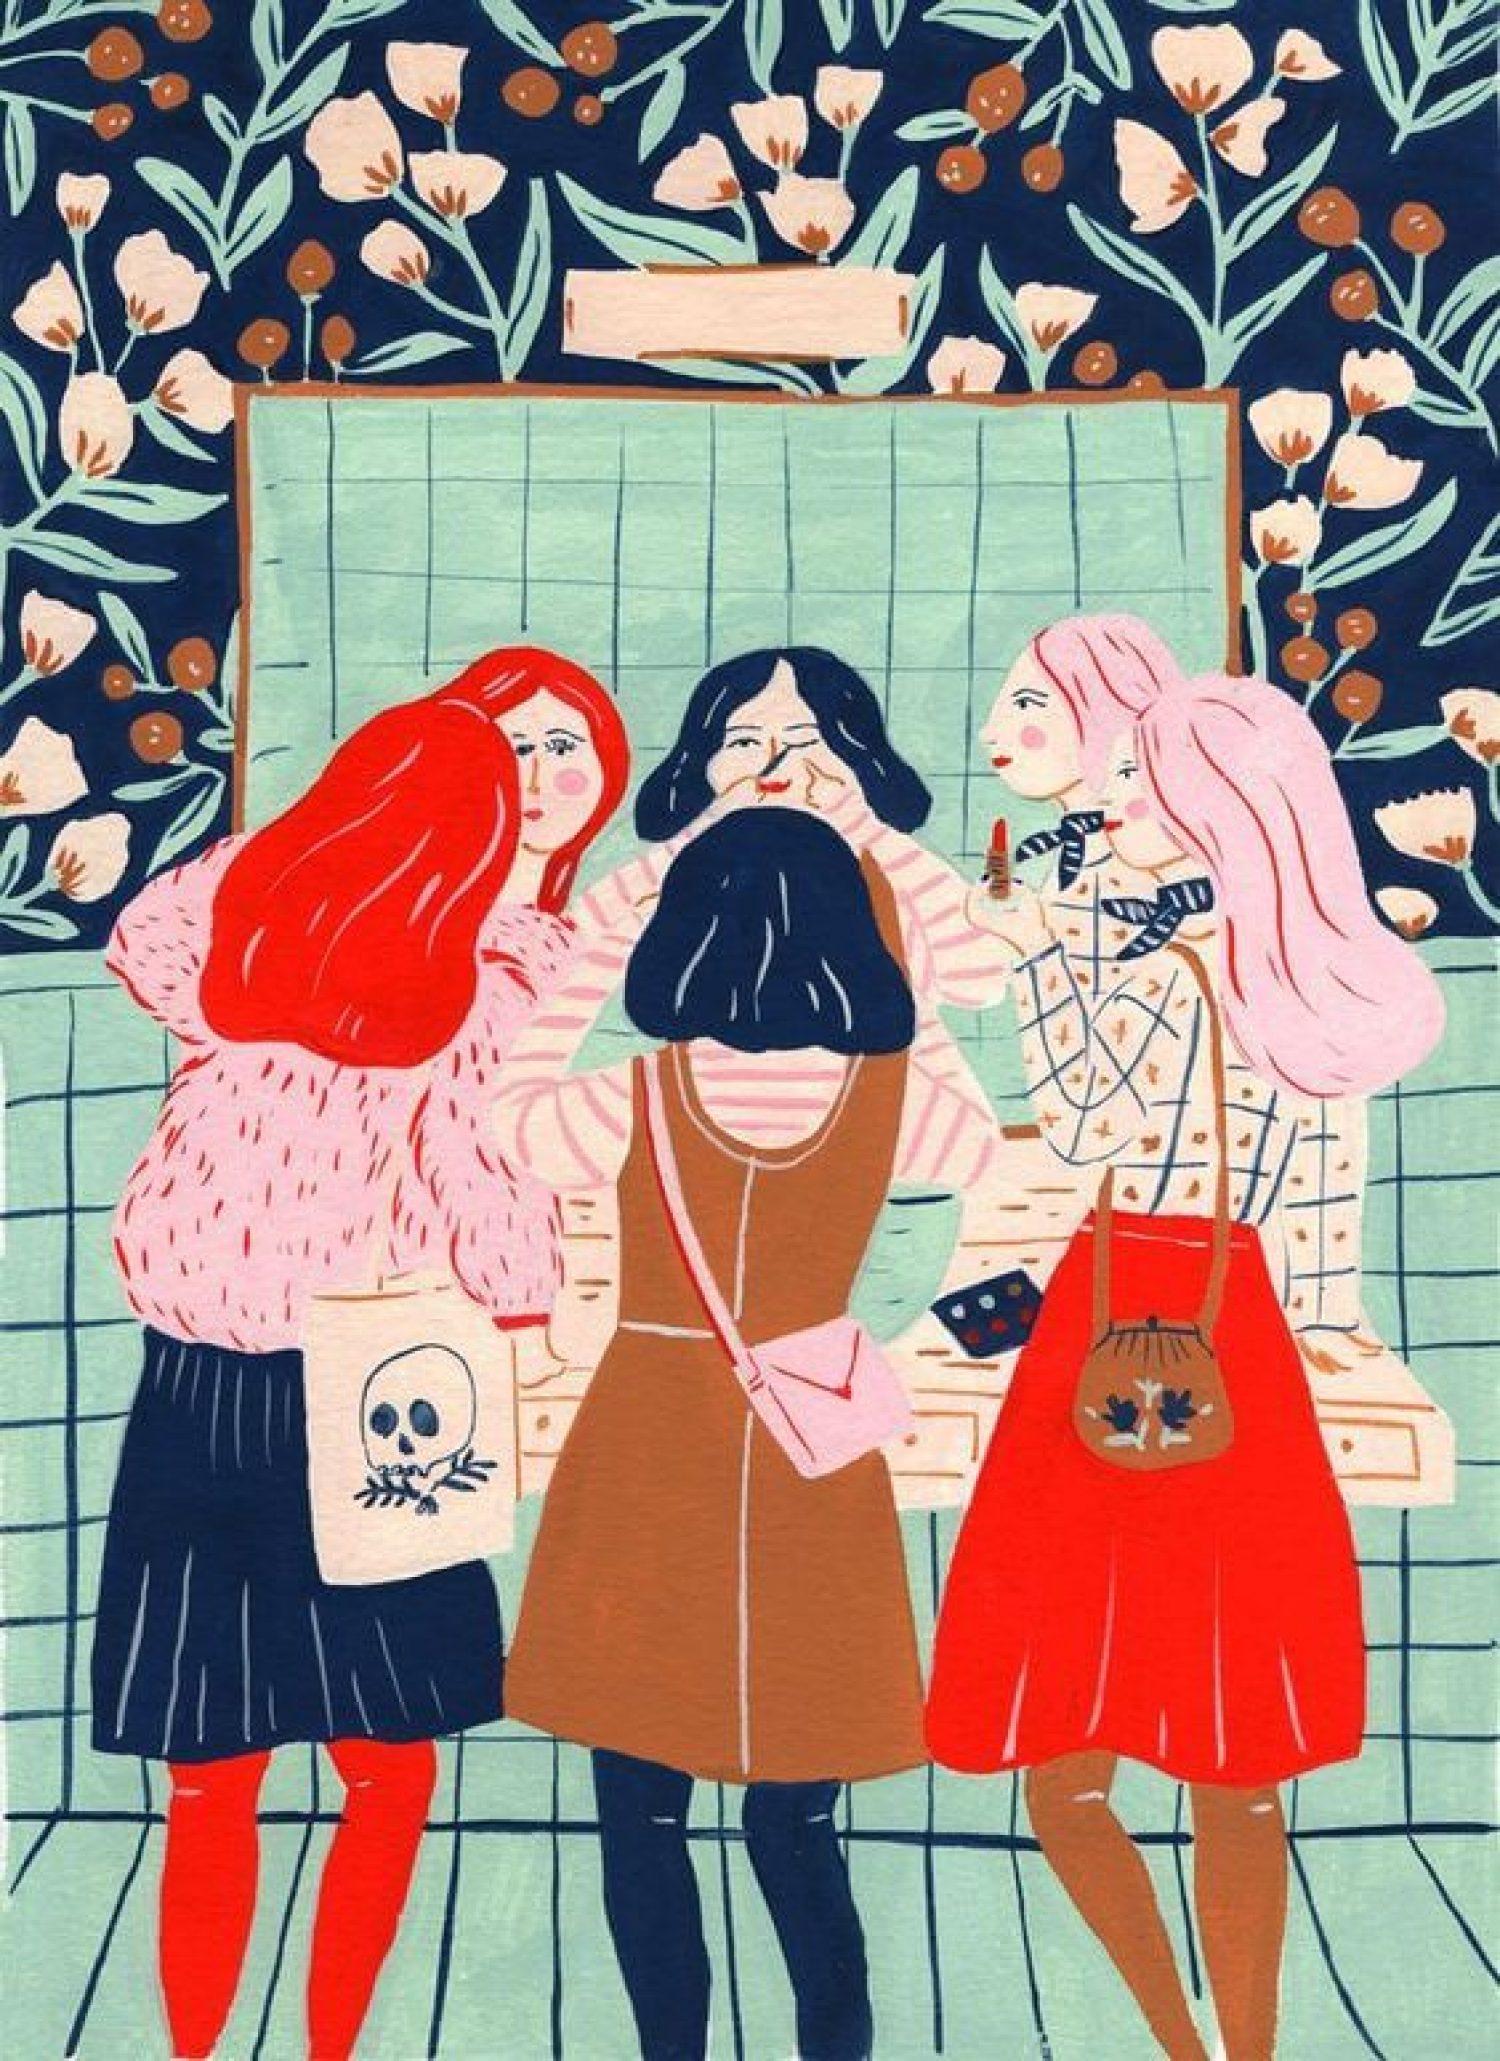 Artwork: JOSEFINA SCHARGORODSKY